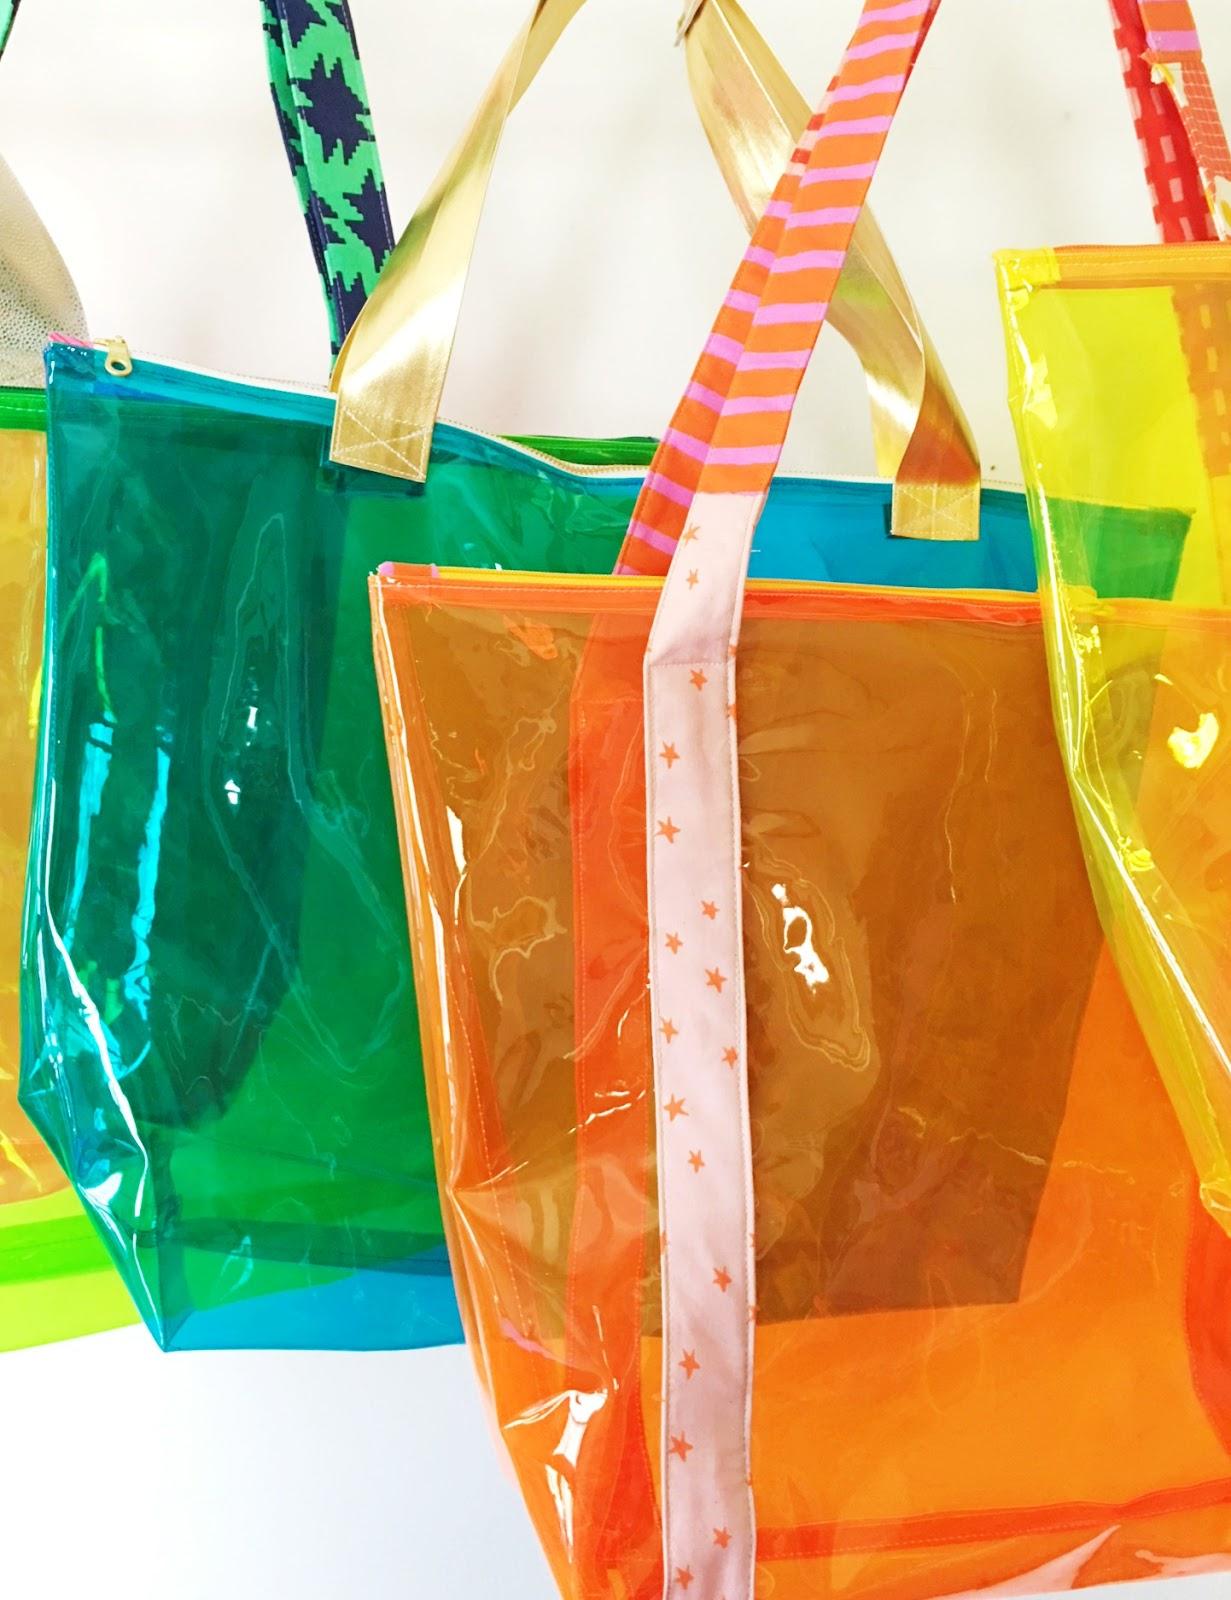 Sewing Vinyl Bags Zipper Pouch Sewhungryhippie Fast Vinyl Santorini Tote Sewing Tutorial